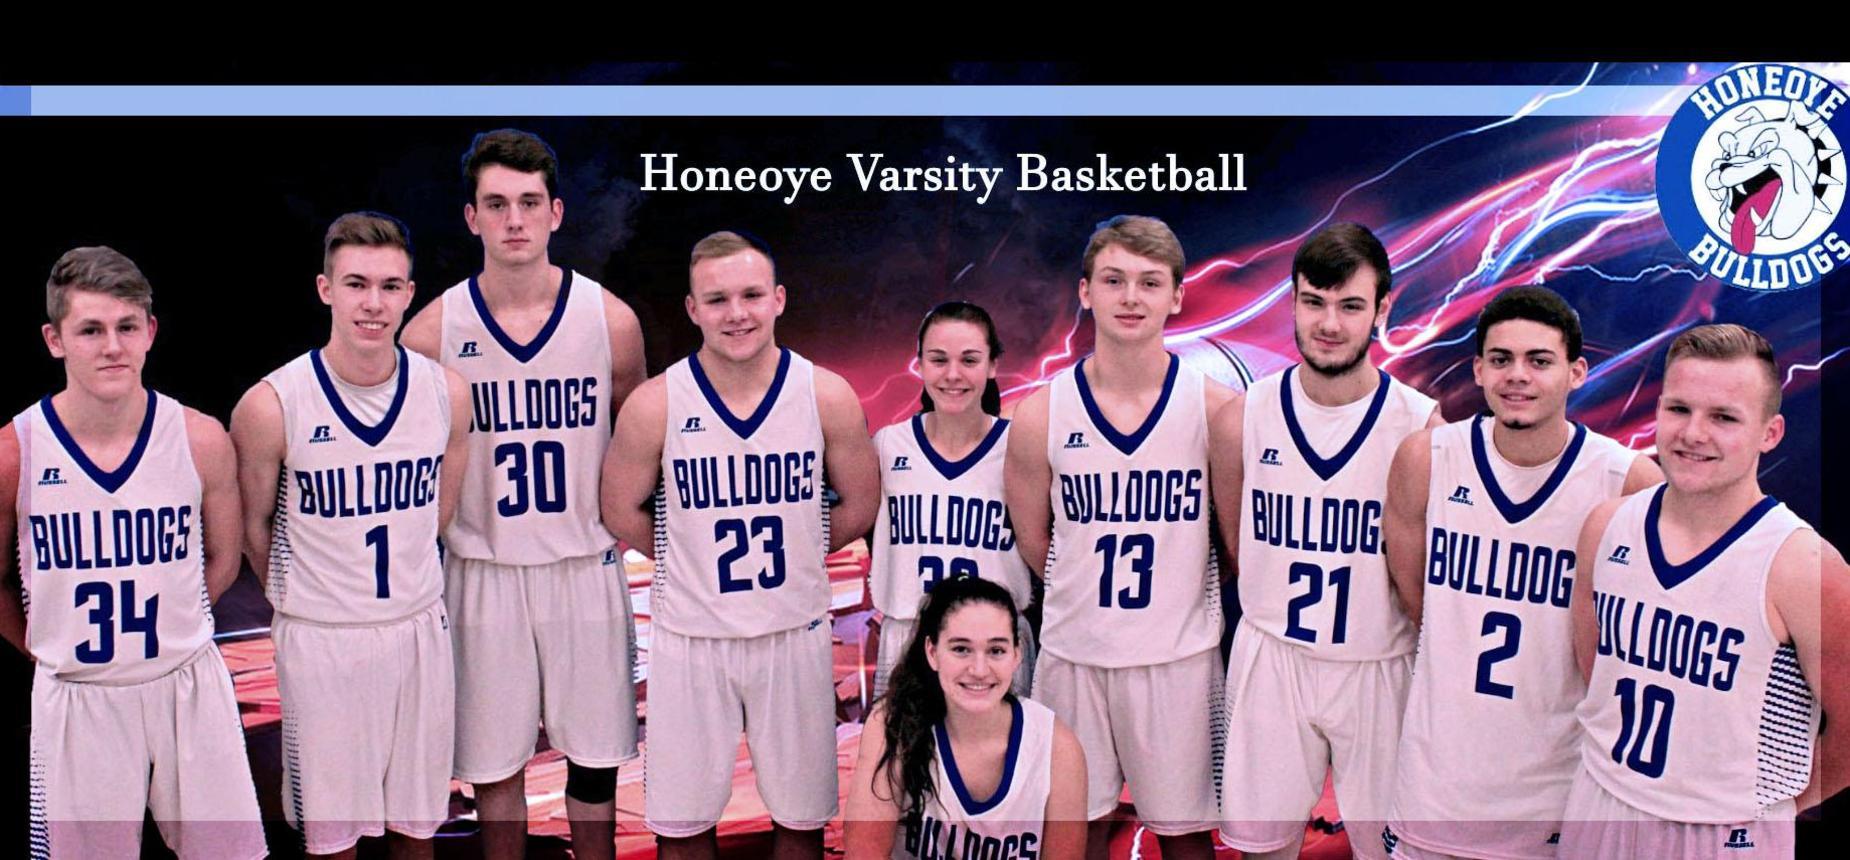 HCS Varsity Basketball team